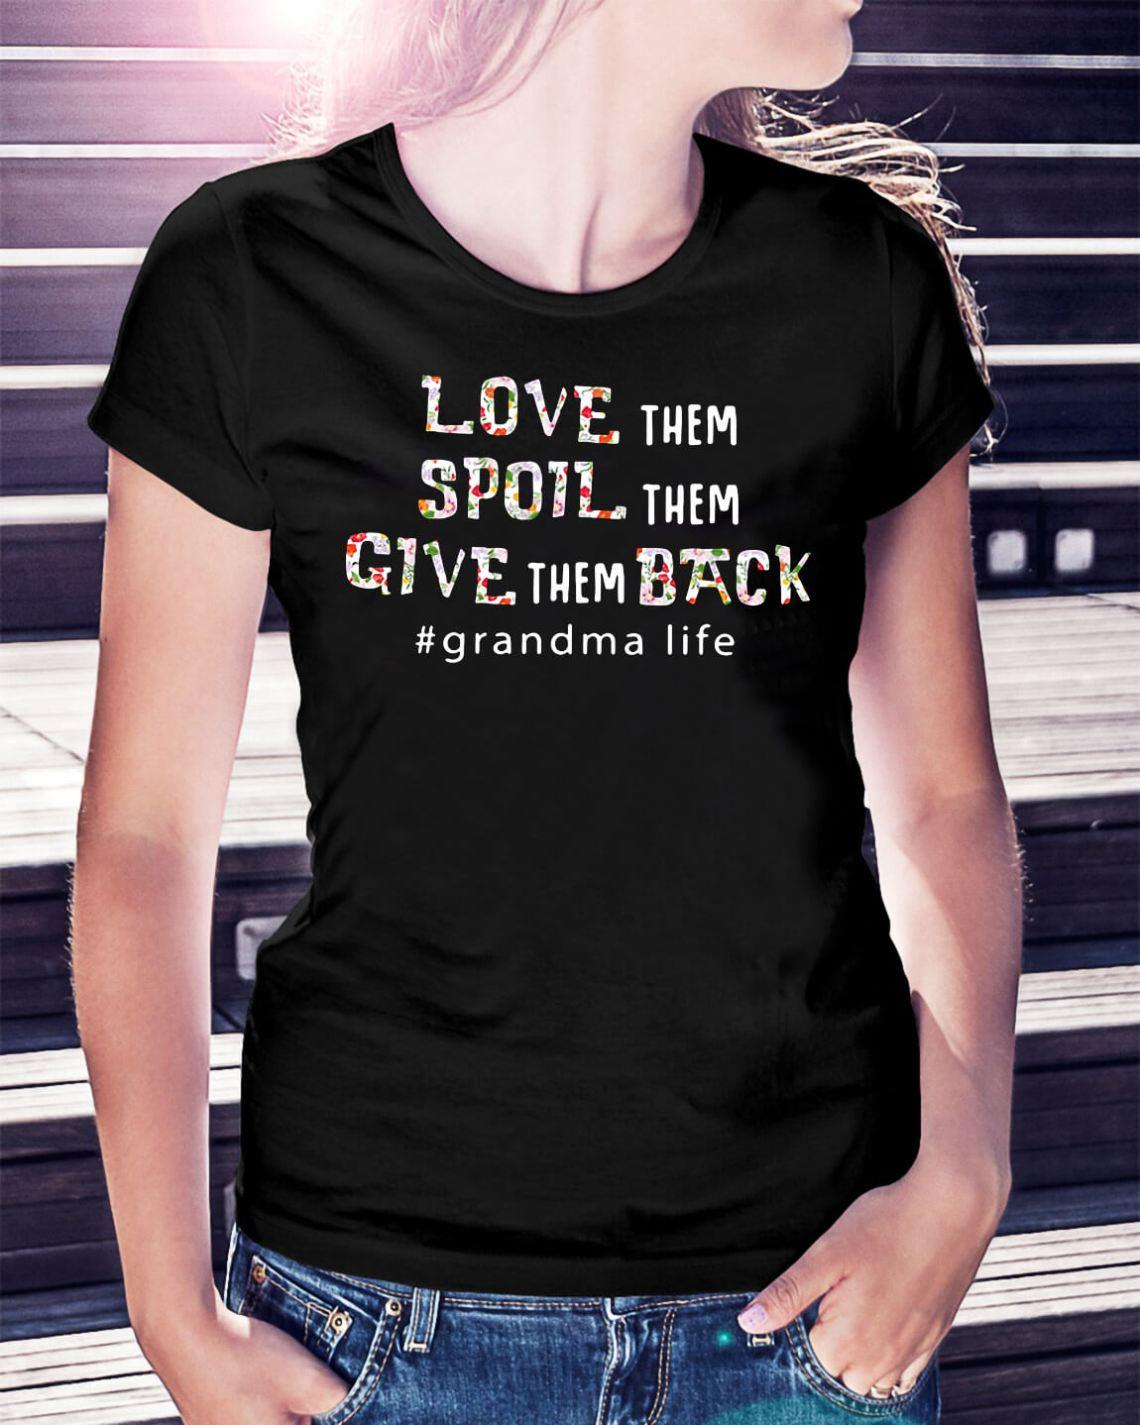 Download Love them spoil them give them back #grandma life shirt ...